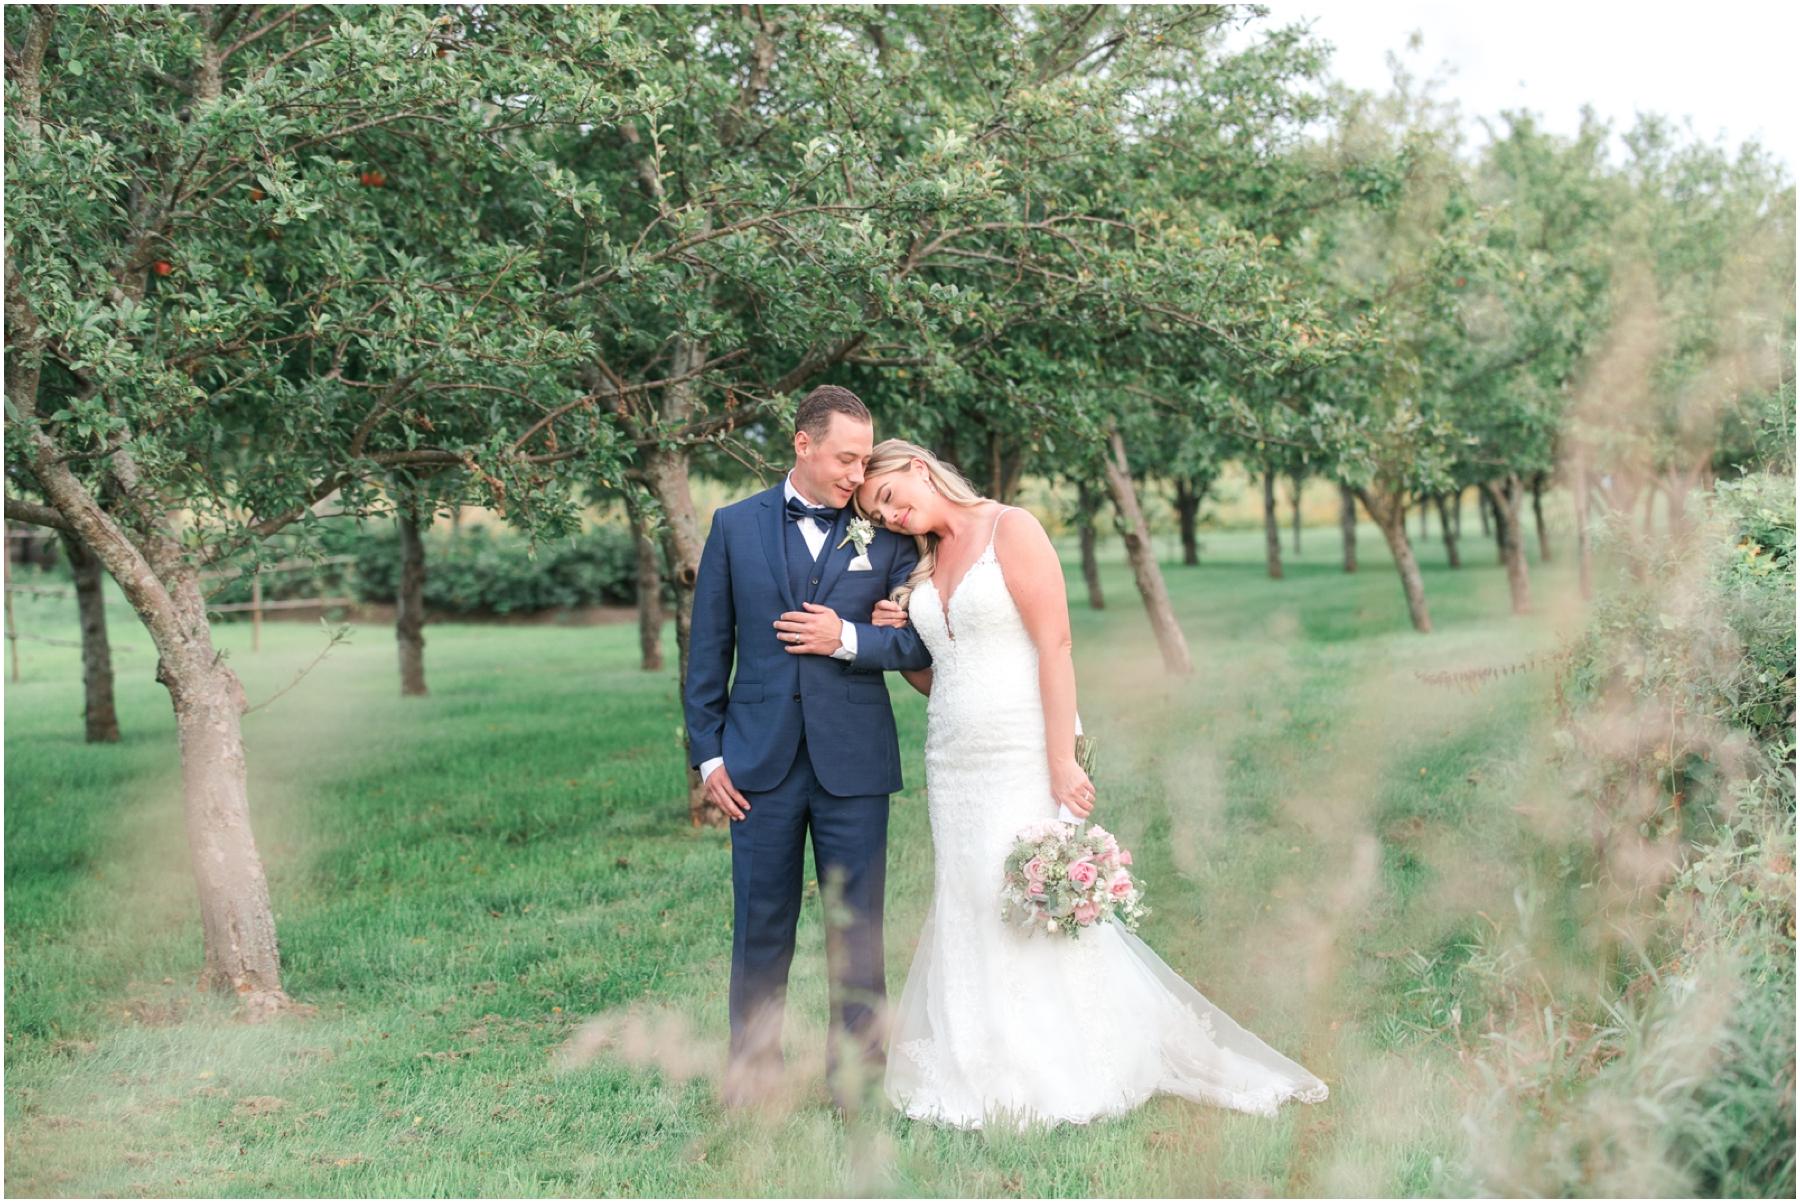 Bloom Field Gardens Wedding Precious Photography Katherine & Chris_094